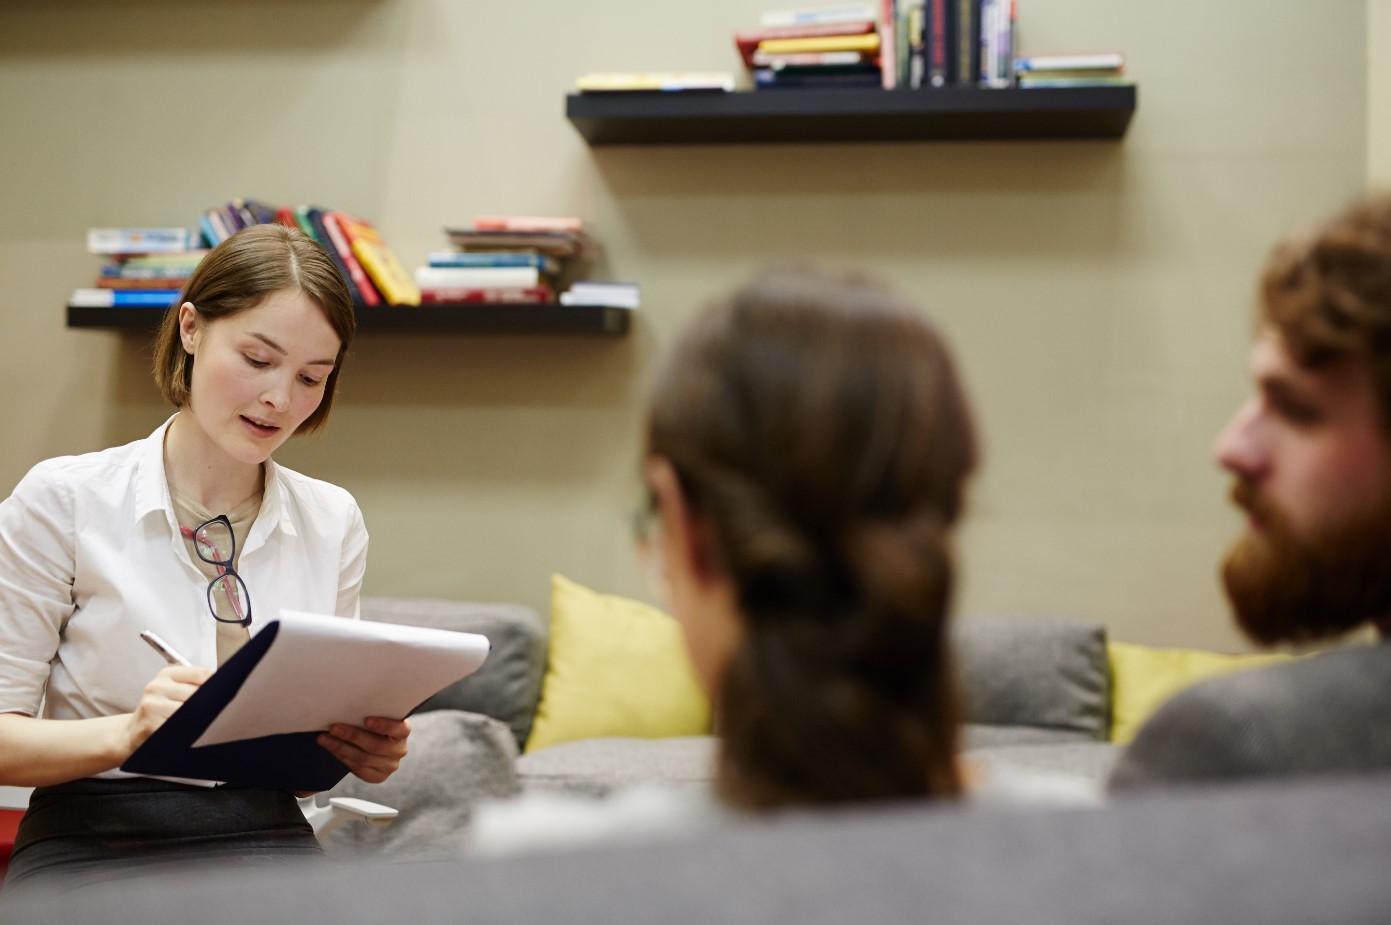 Psikolojik Tedavi Ne Kadar Sürer?